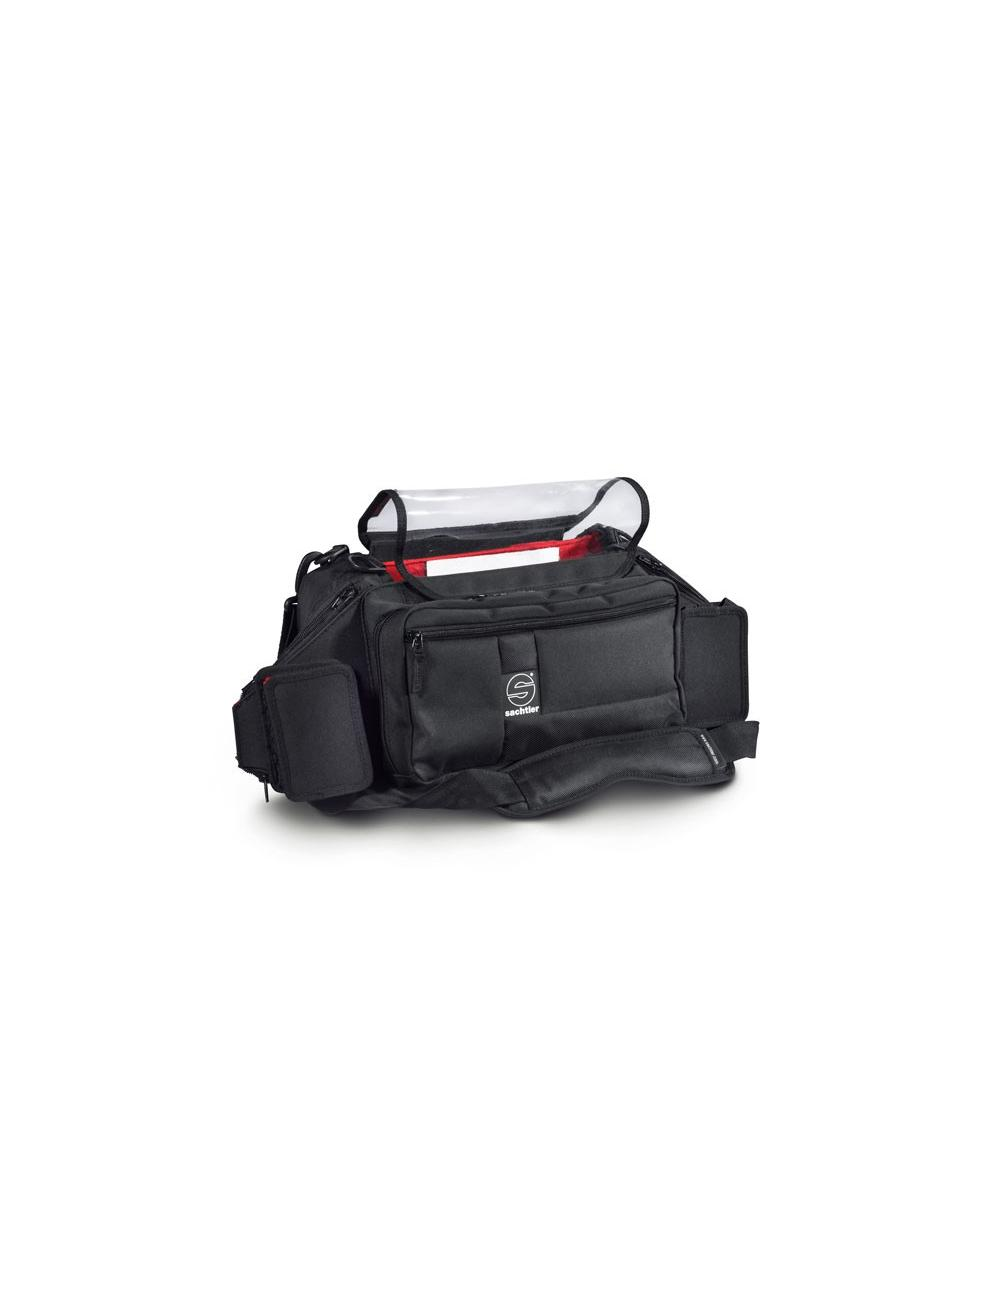 SACHTLER - SN614 - Lightweight audio bag mediana